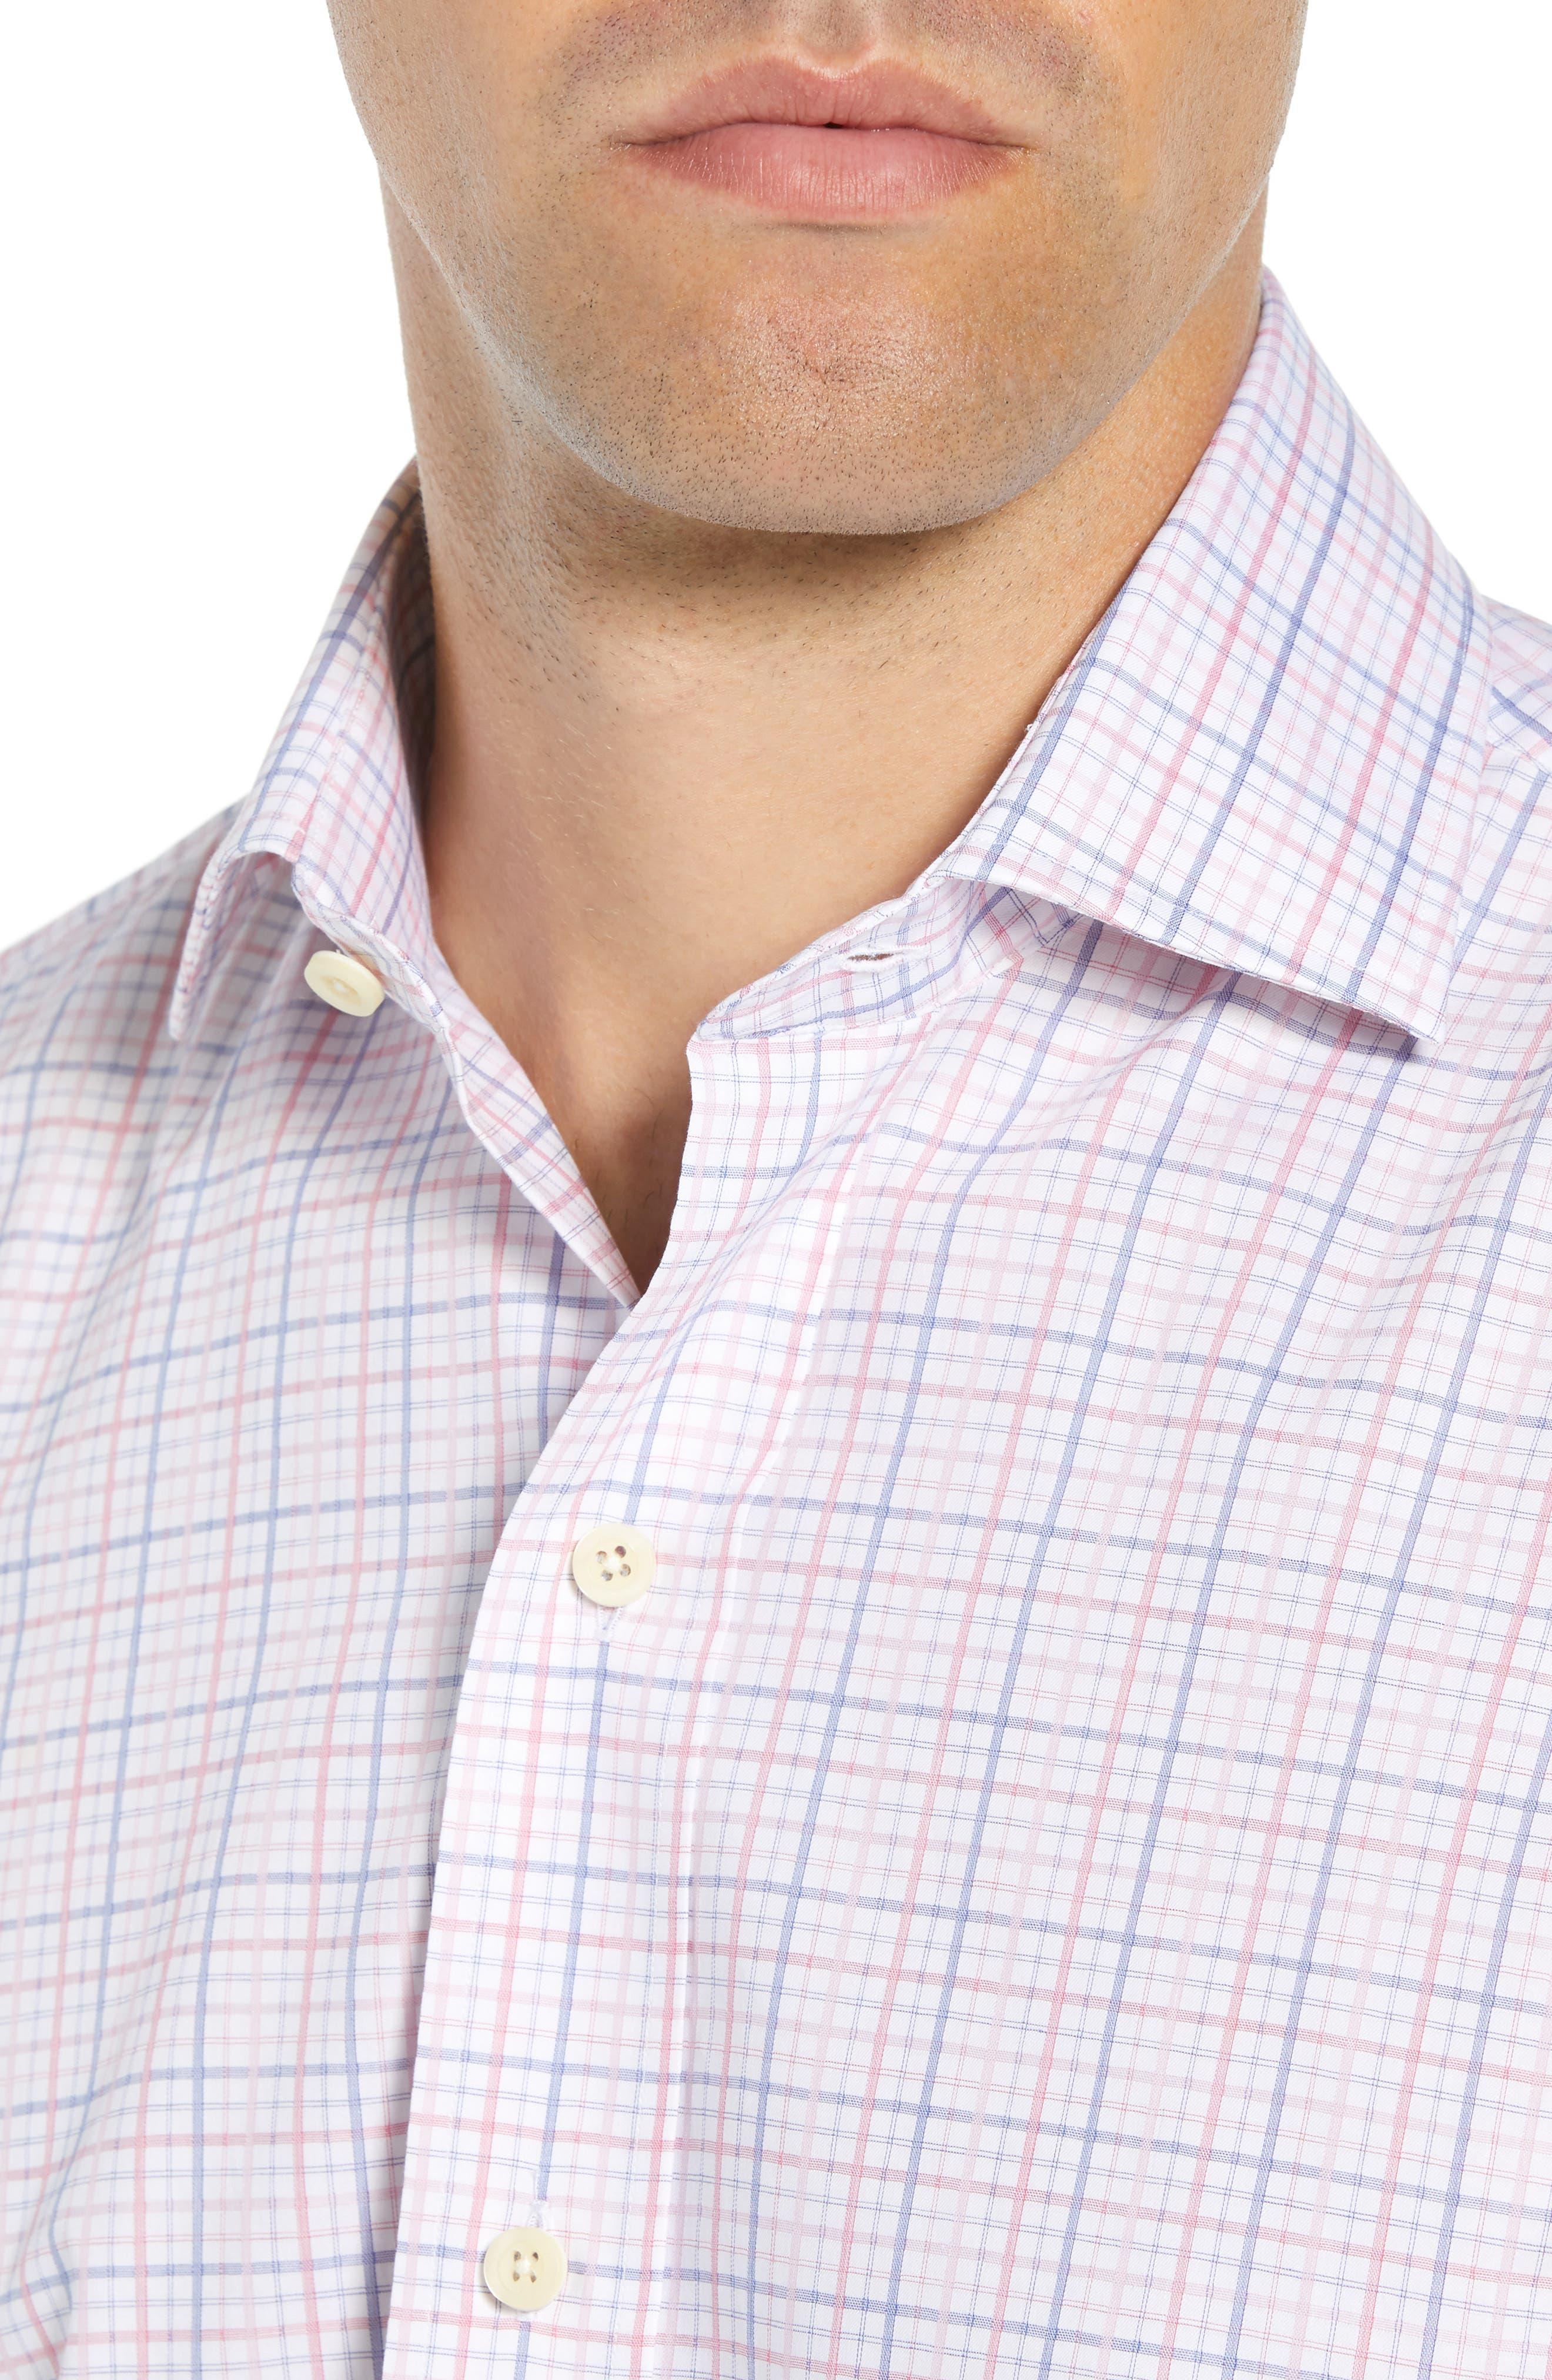 Drazin Trim Fit Check Dress Shirt,                             Alternate thumbnail 2, color,                             PINK